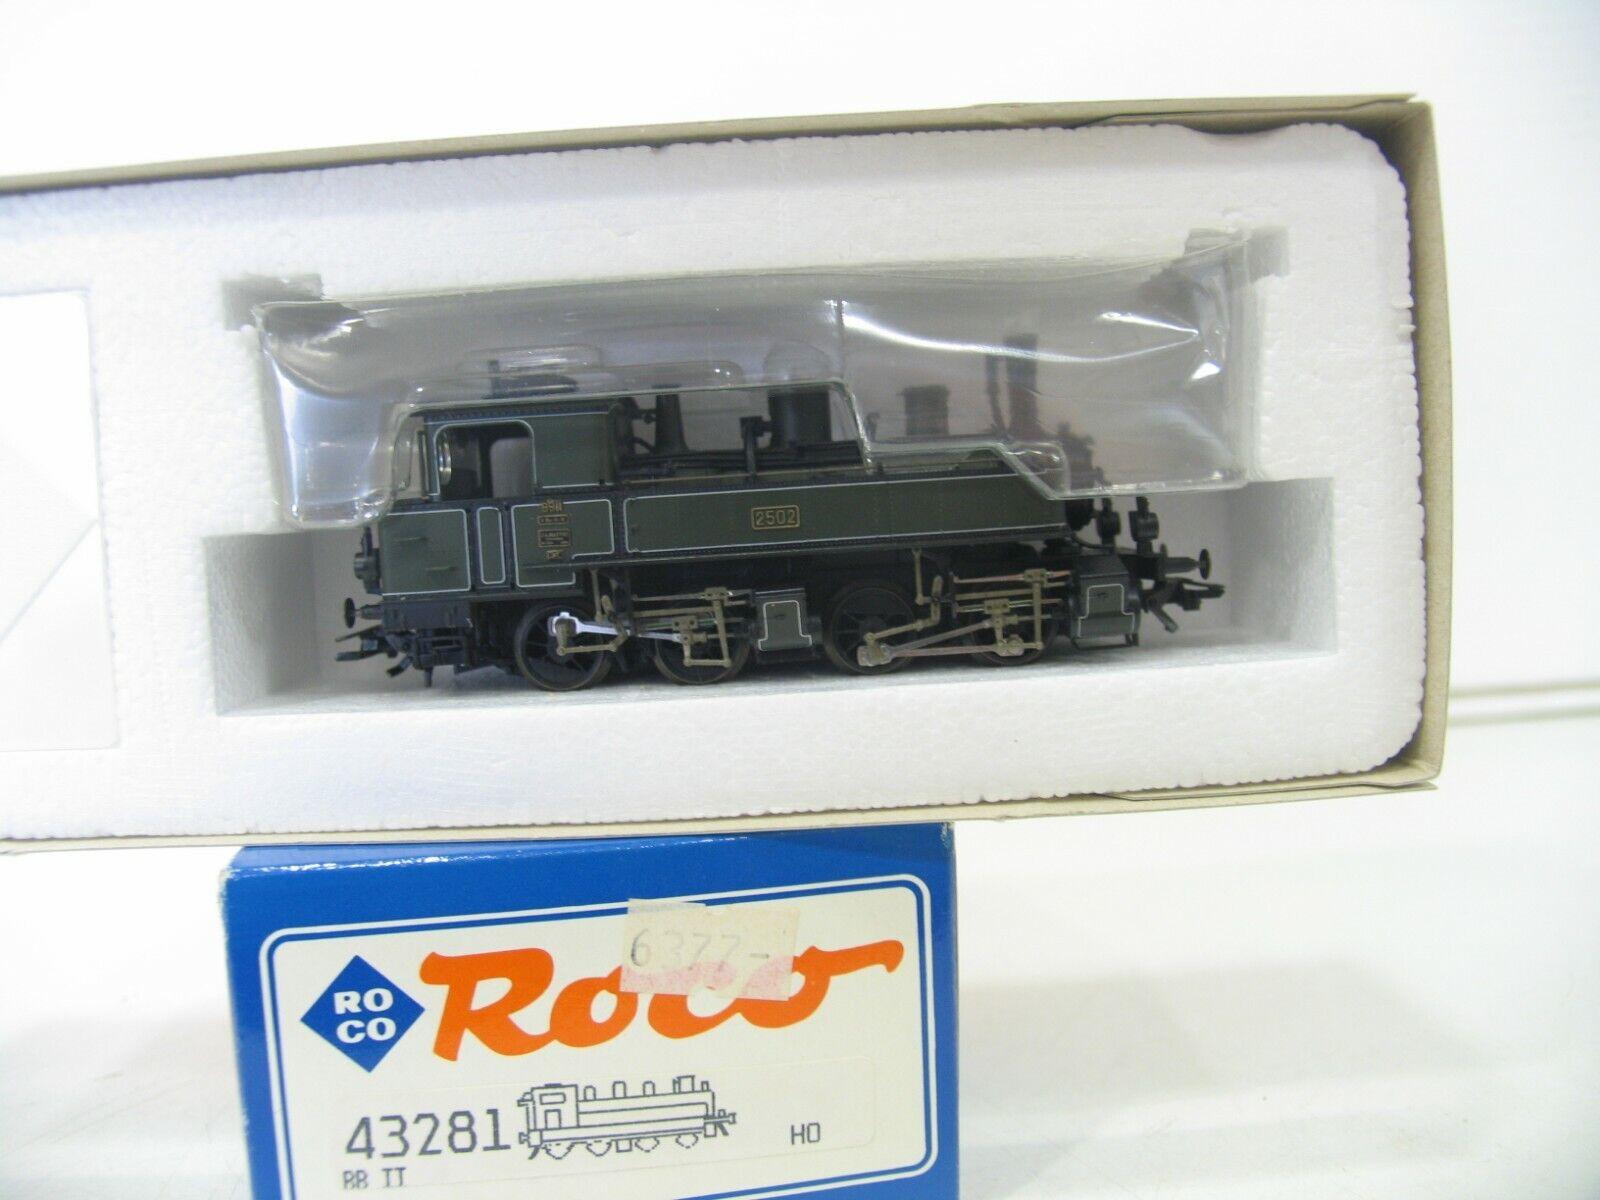 Roco 43281 dampflok bb II der k.bay.sts.b. nh2599